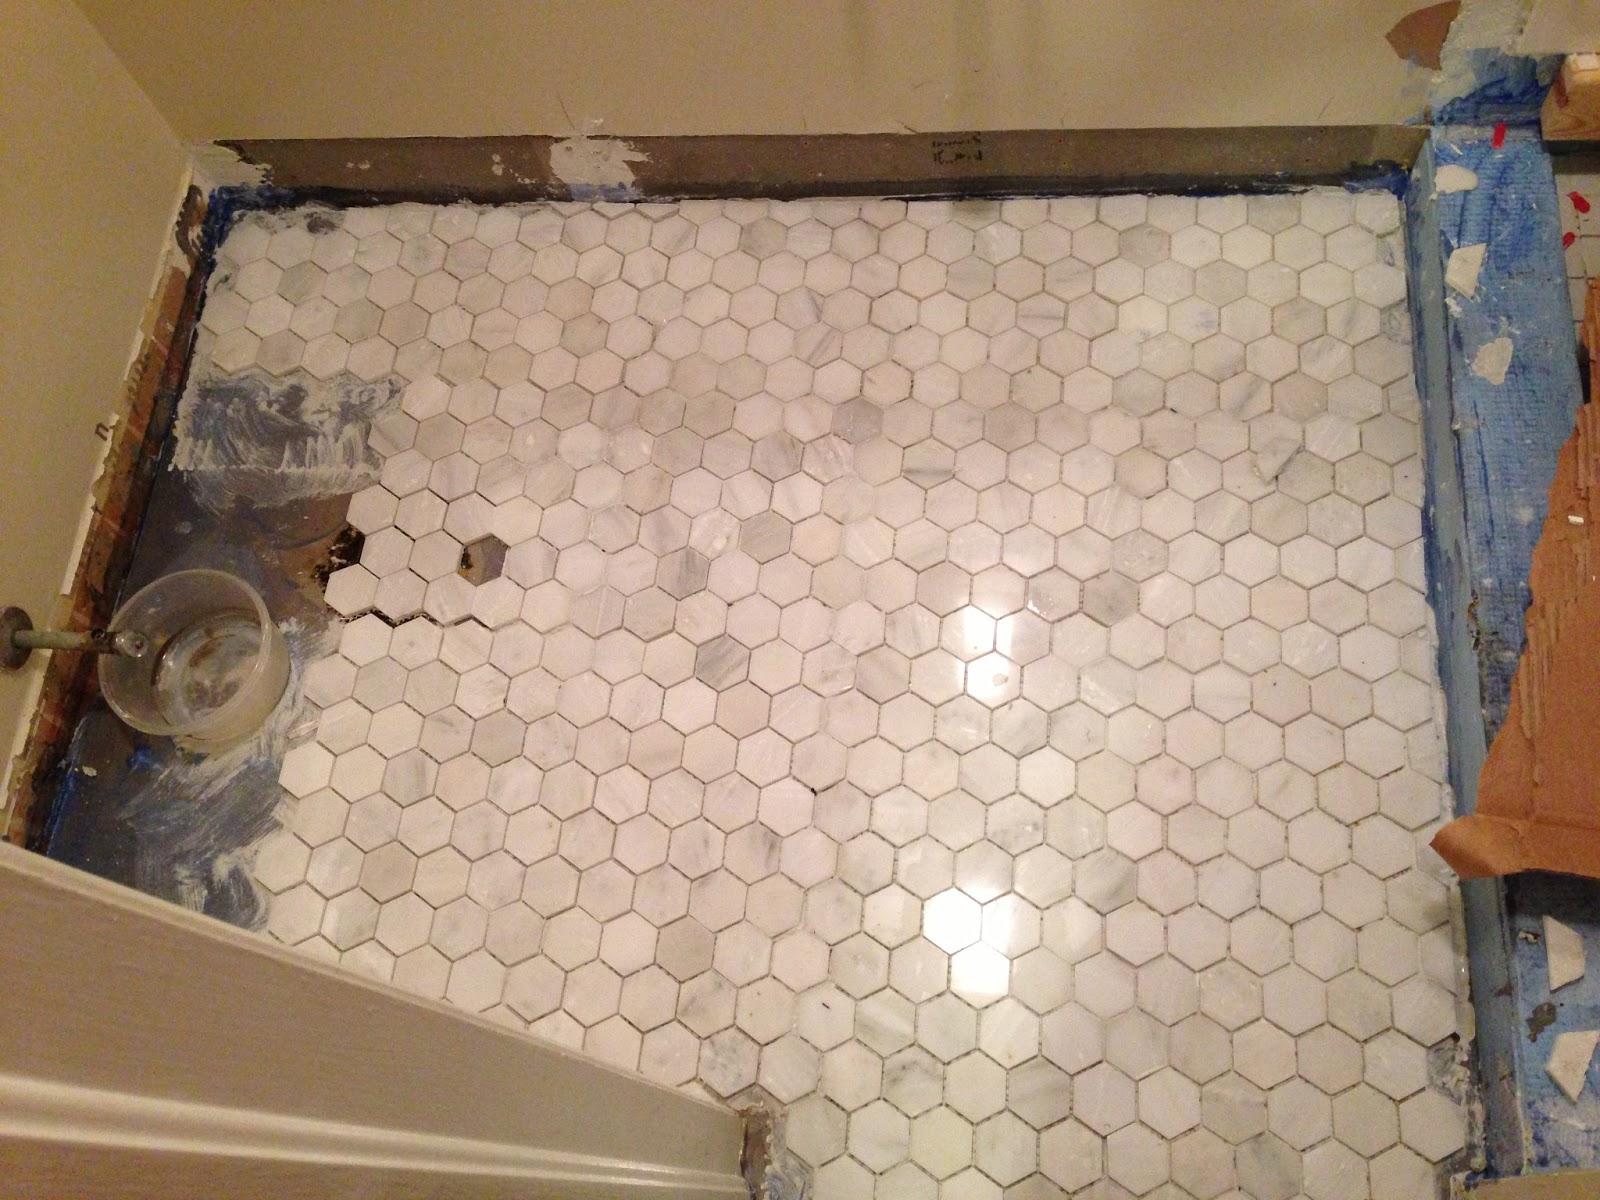 The Shields Family Bathroom Reno Part 3 Tile